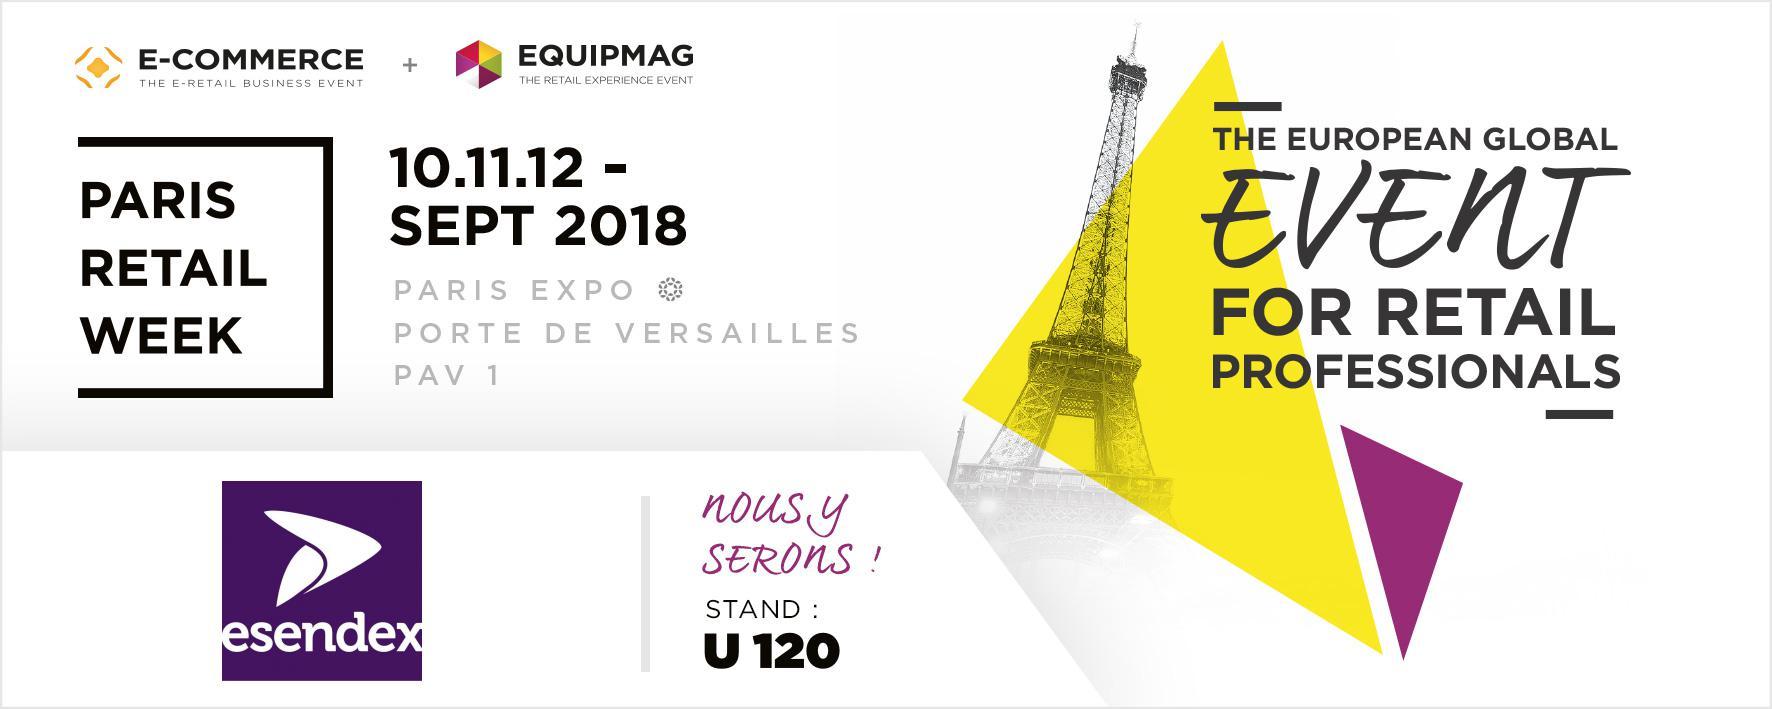 Paris Retail Week stand U120